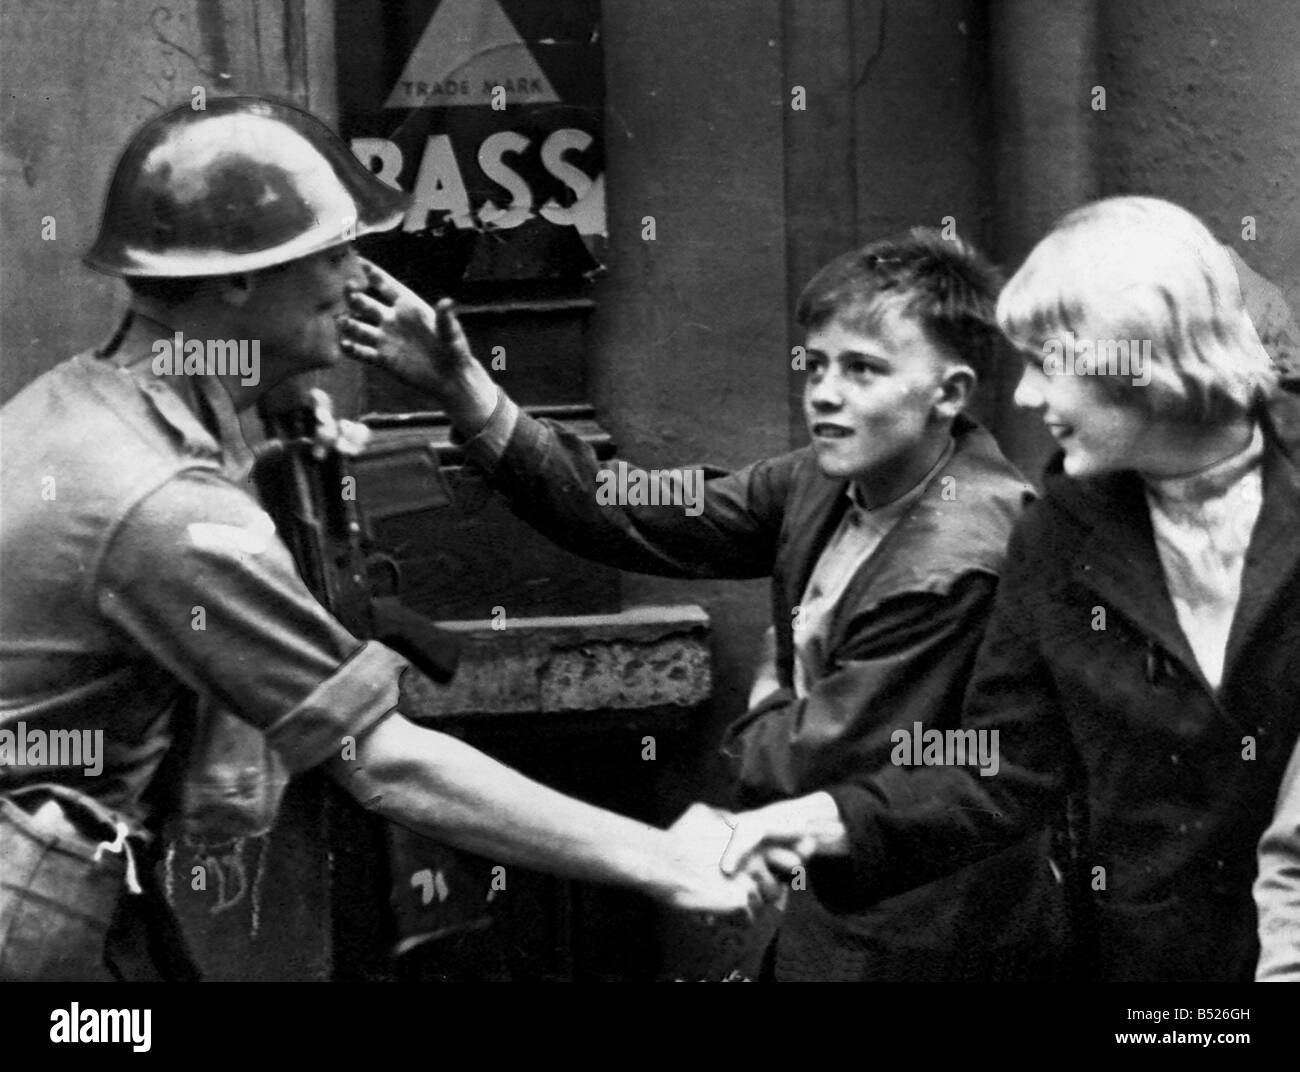 British soldier in Northern Ireland 1969 - Stock Image